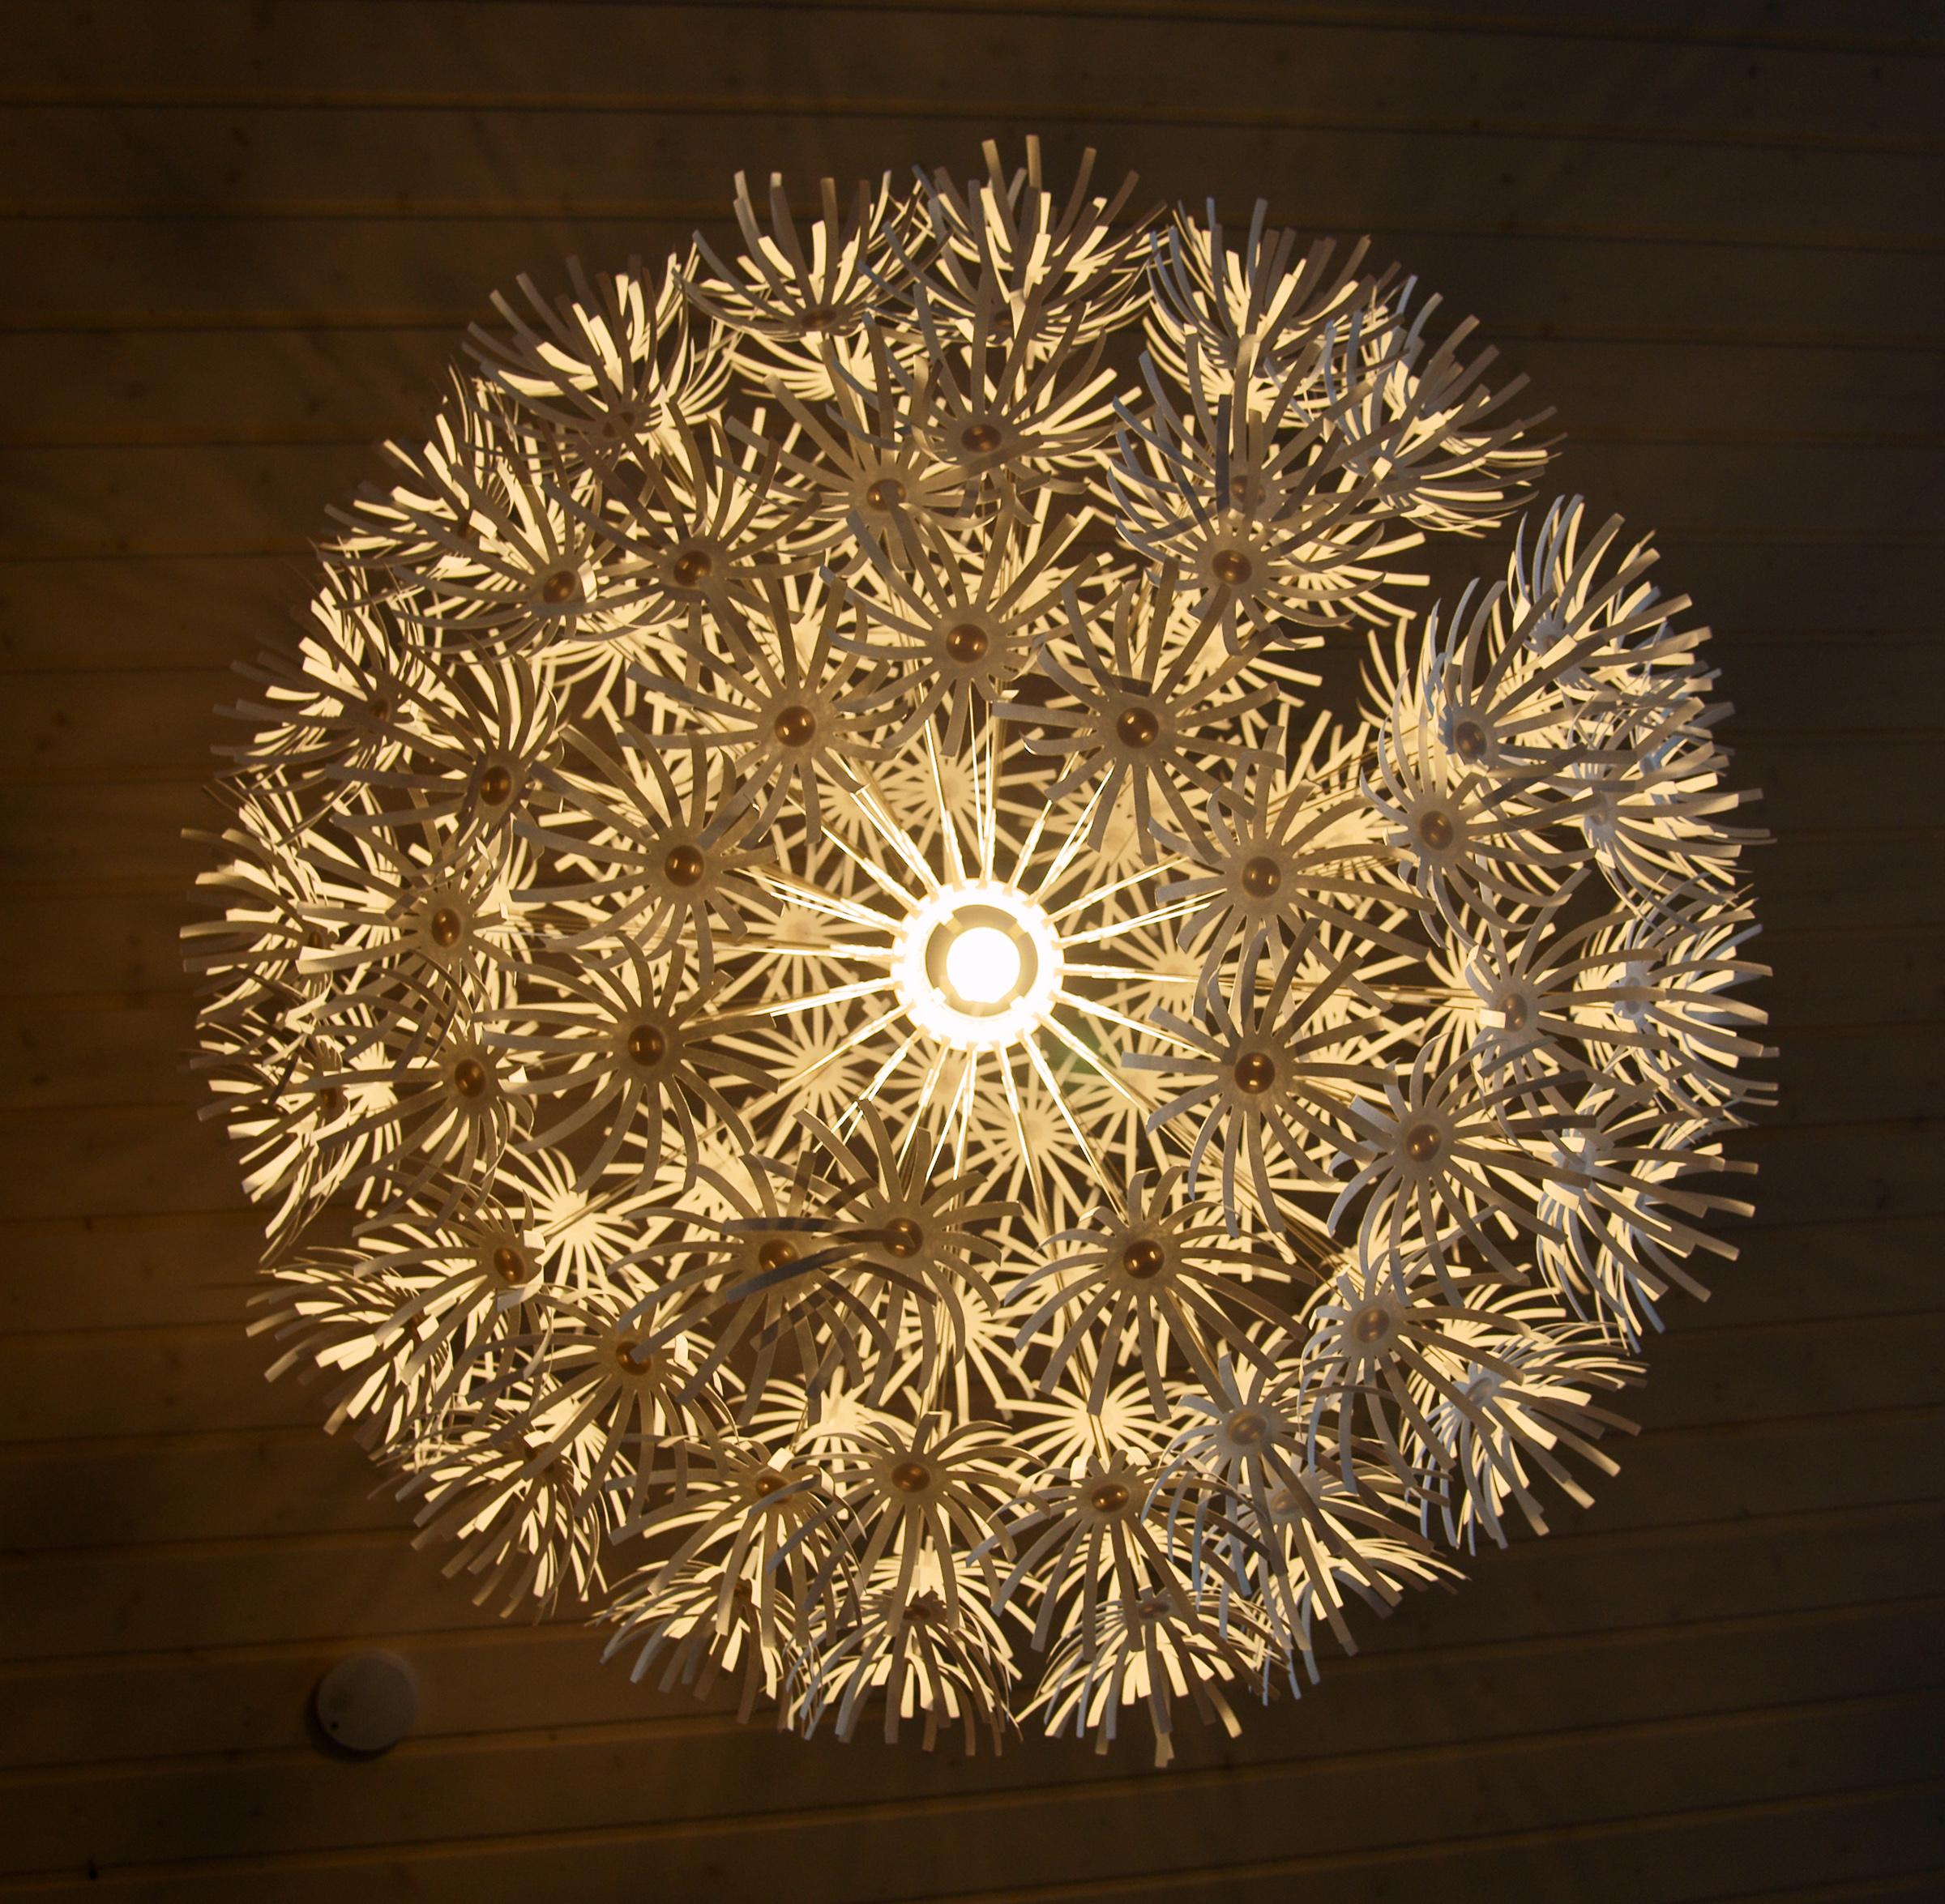 File:Ikea lamp.jpg - Wikimedia Commons